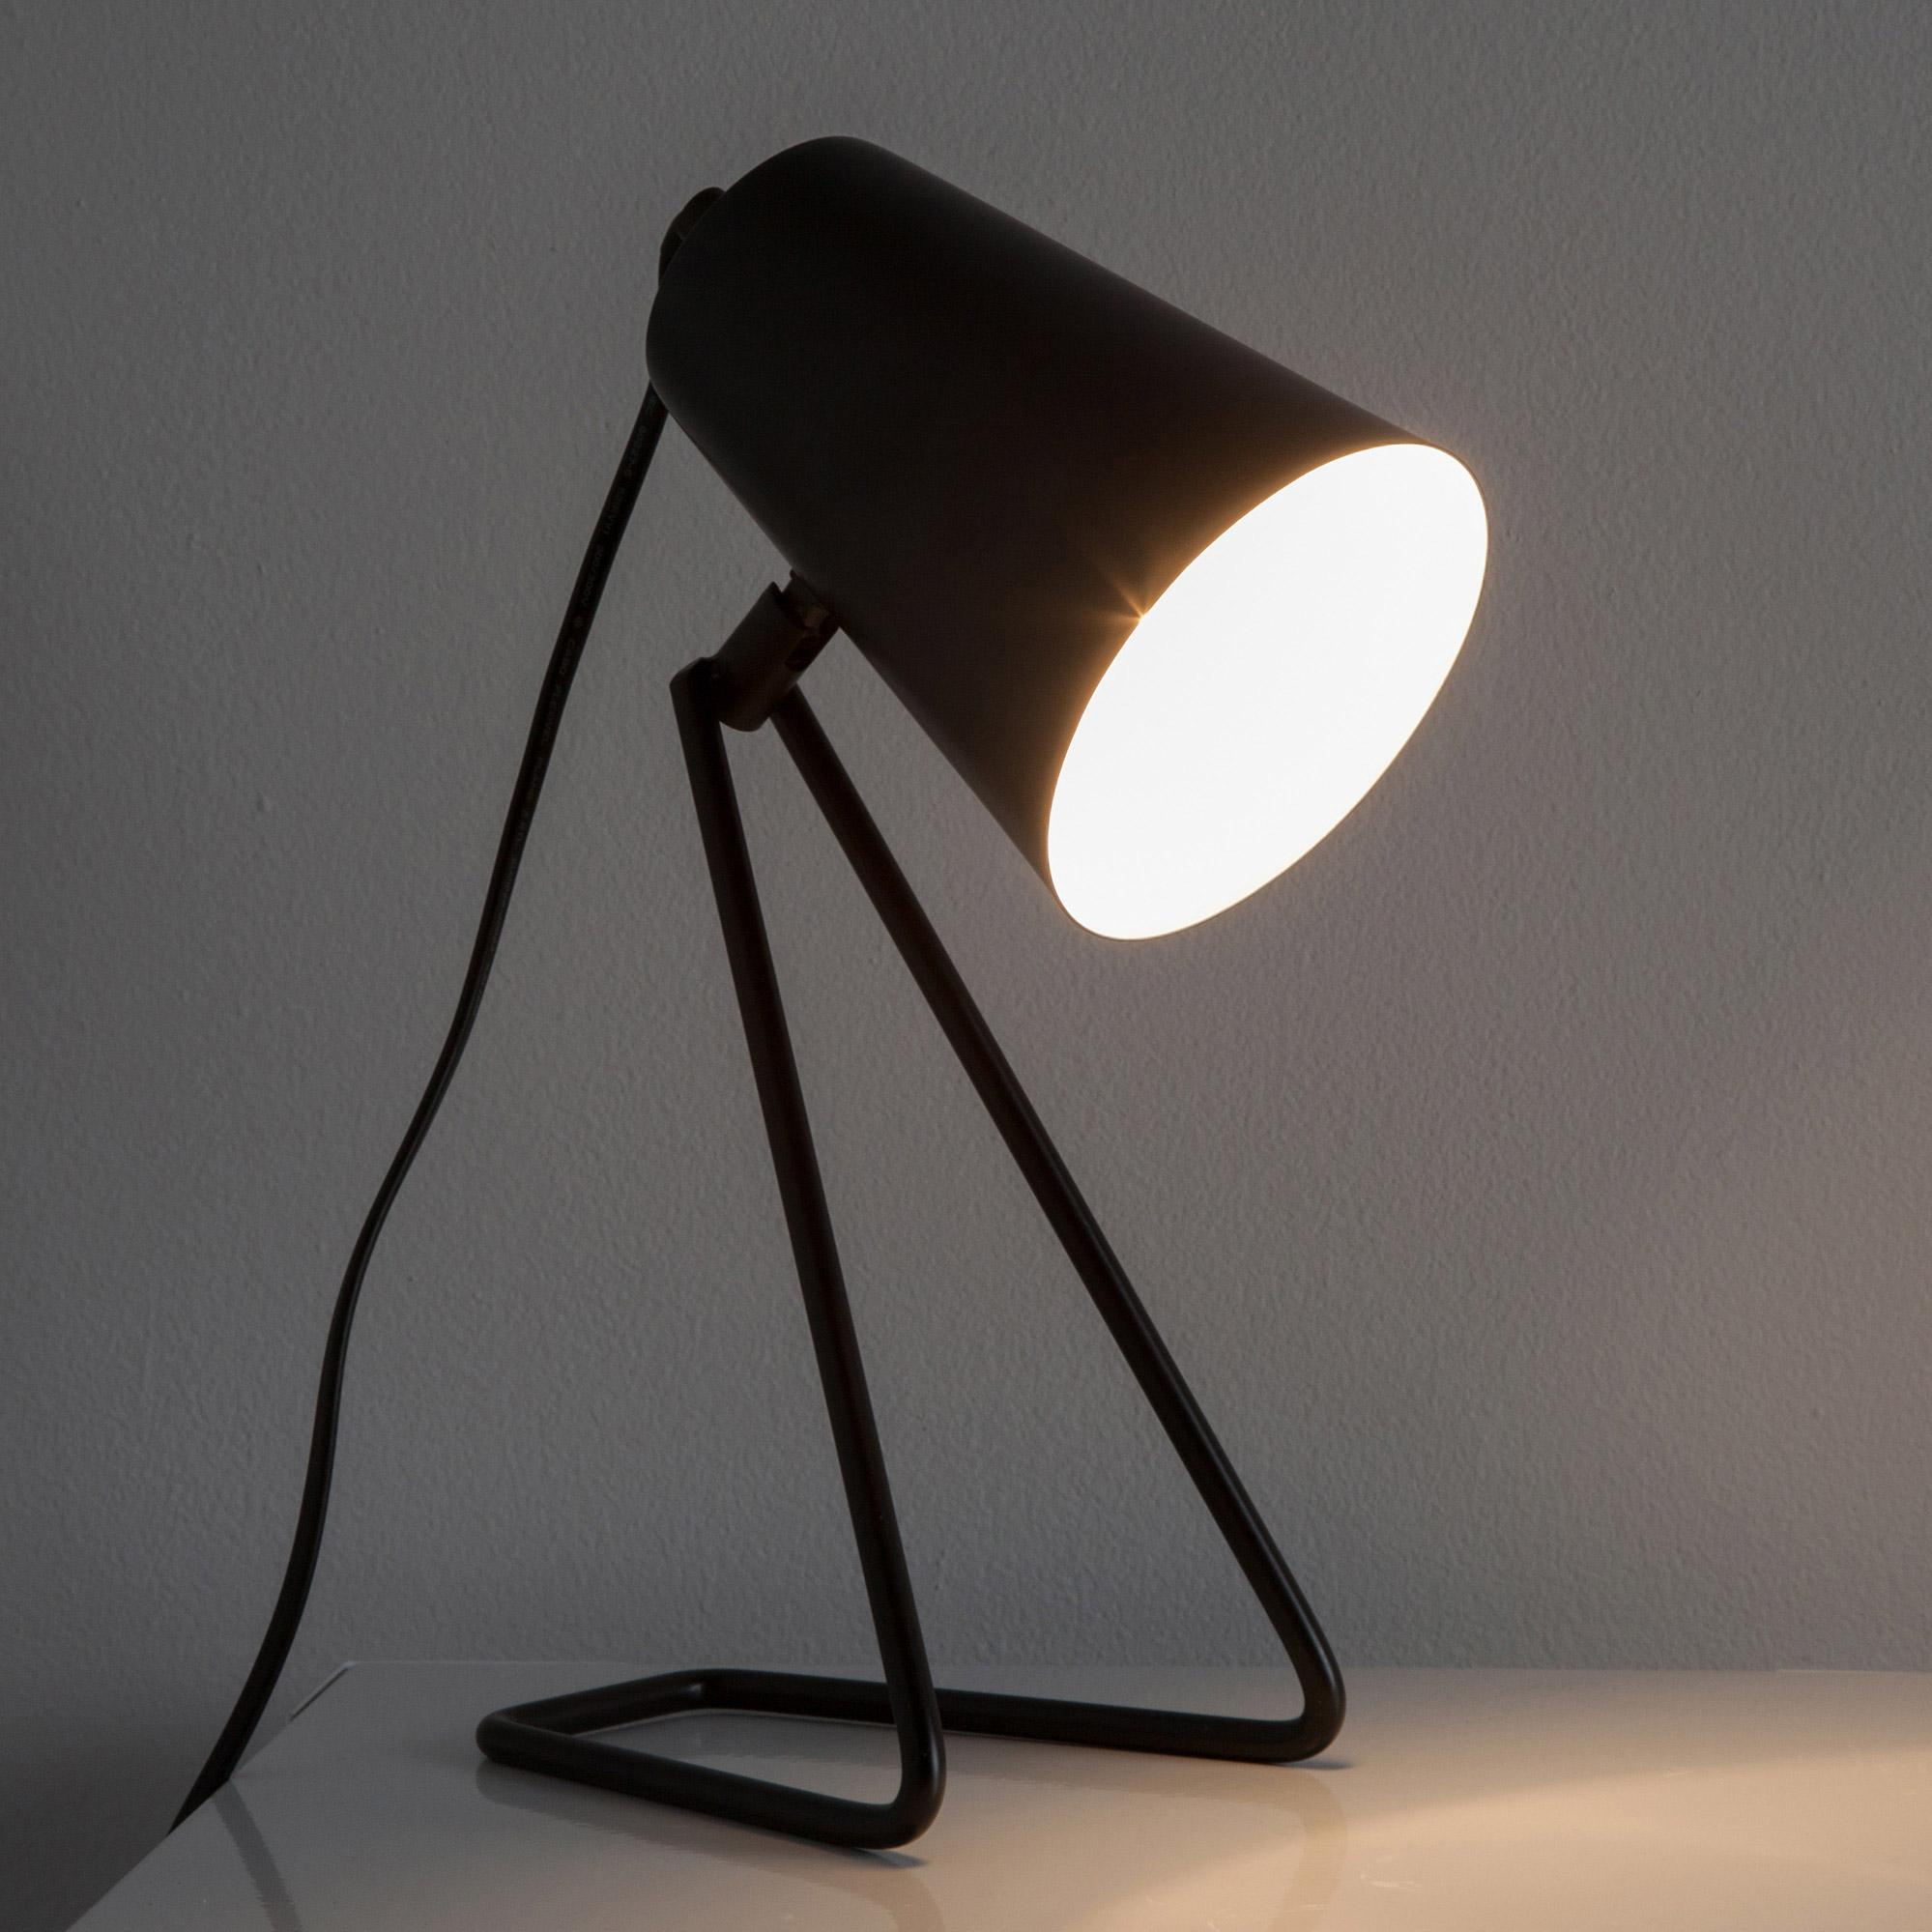 Lampe, design, métal noir, INSPIRE Moeta